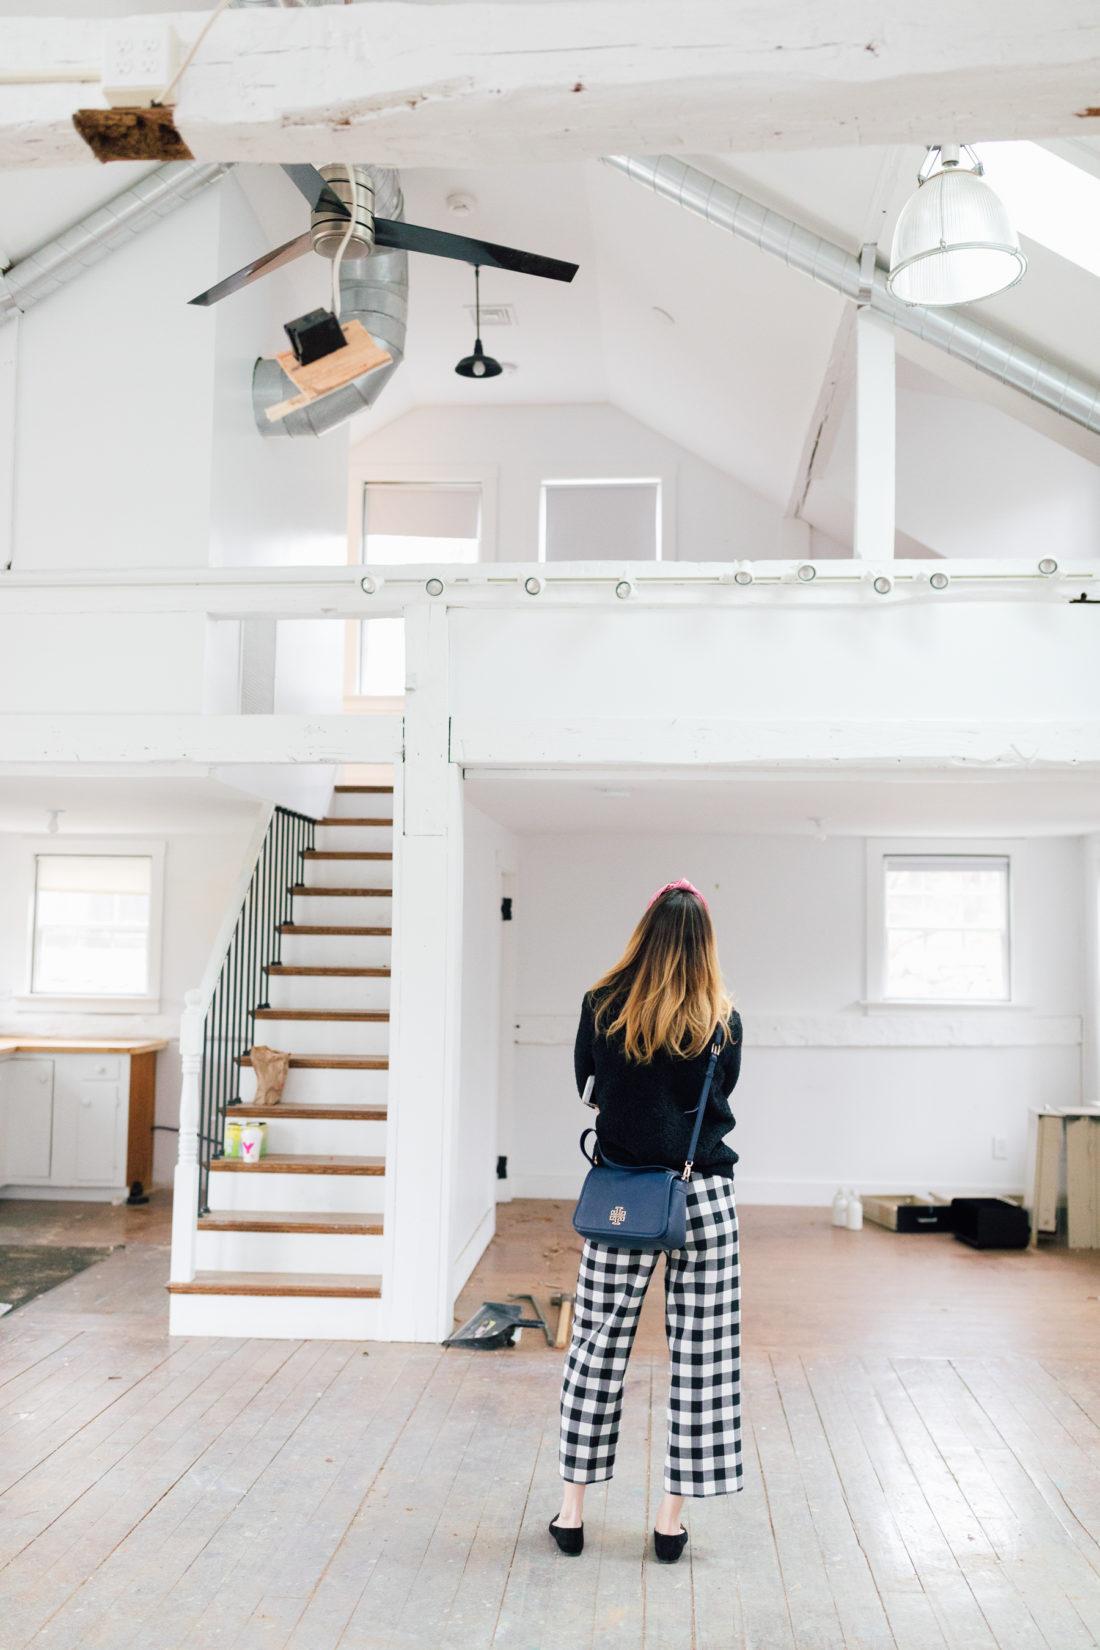 Eva Amurri Martino stands in the preliminary renovation of her new studio space in Westport Connecticut